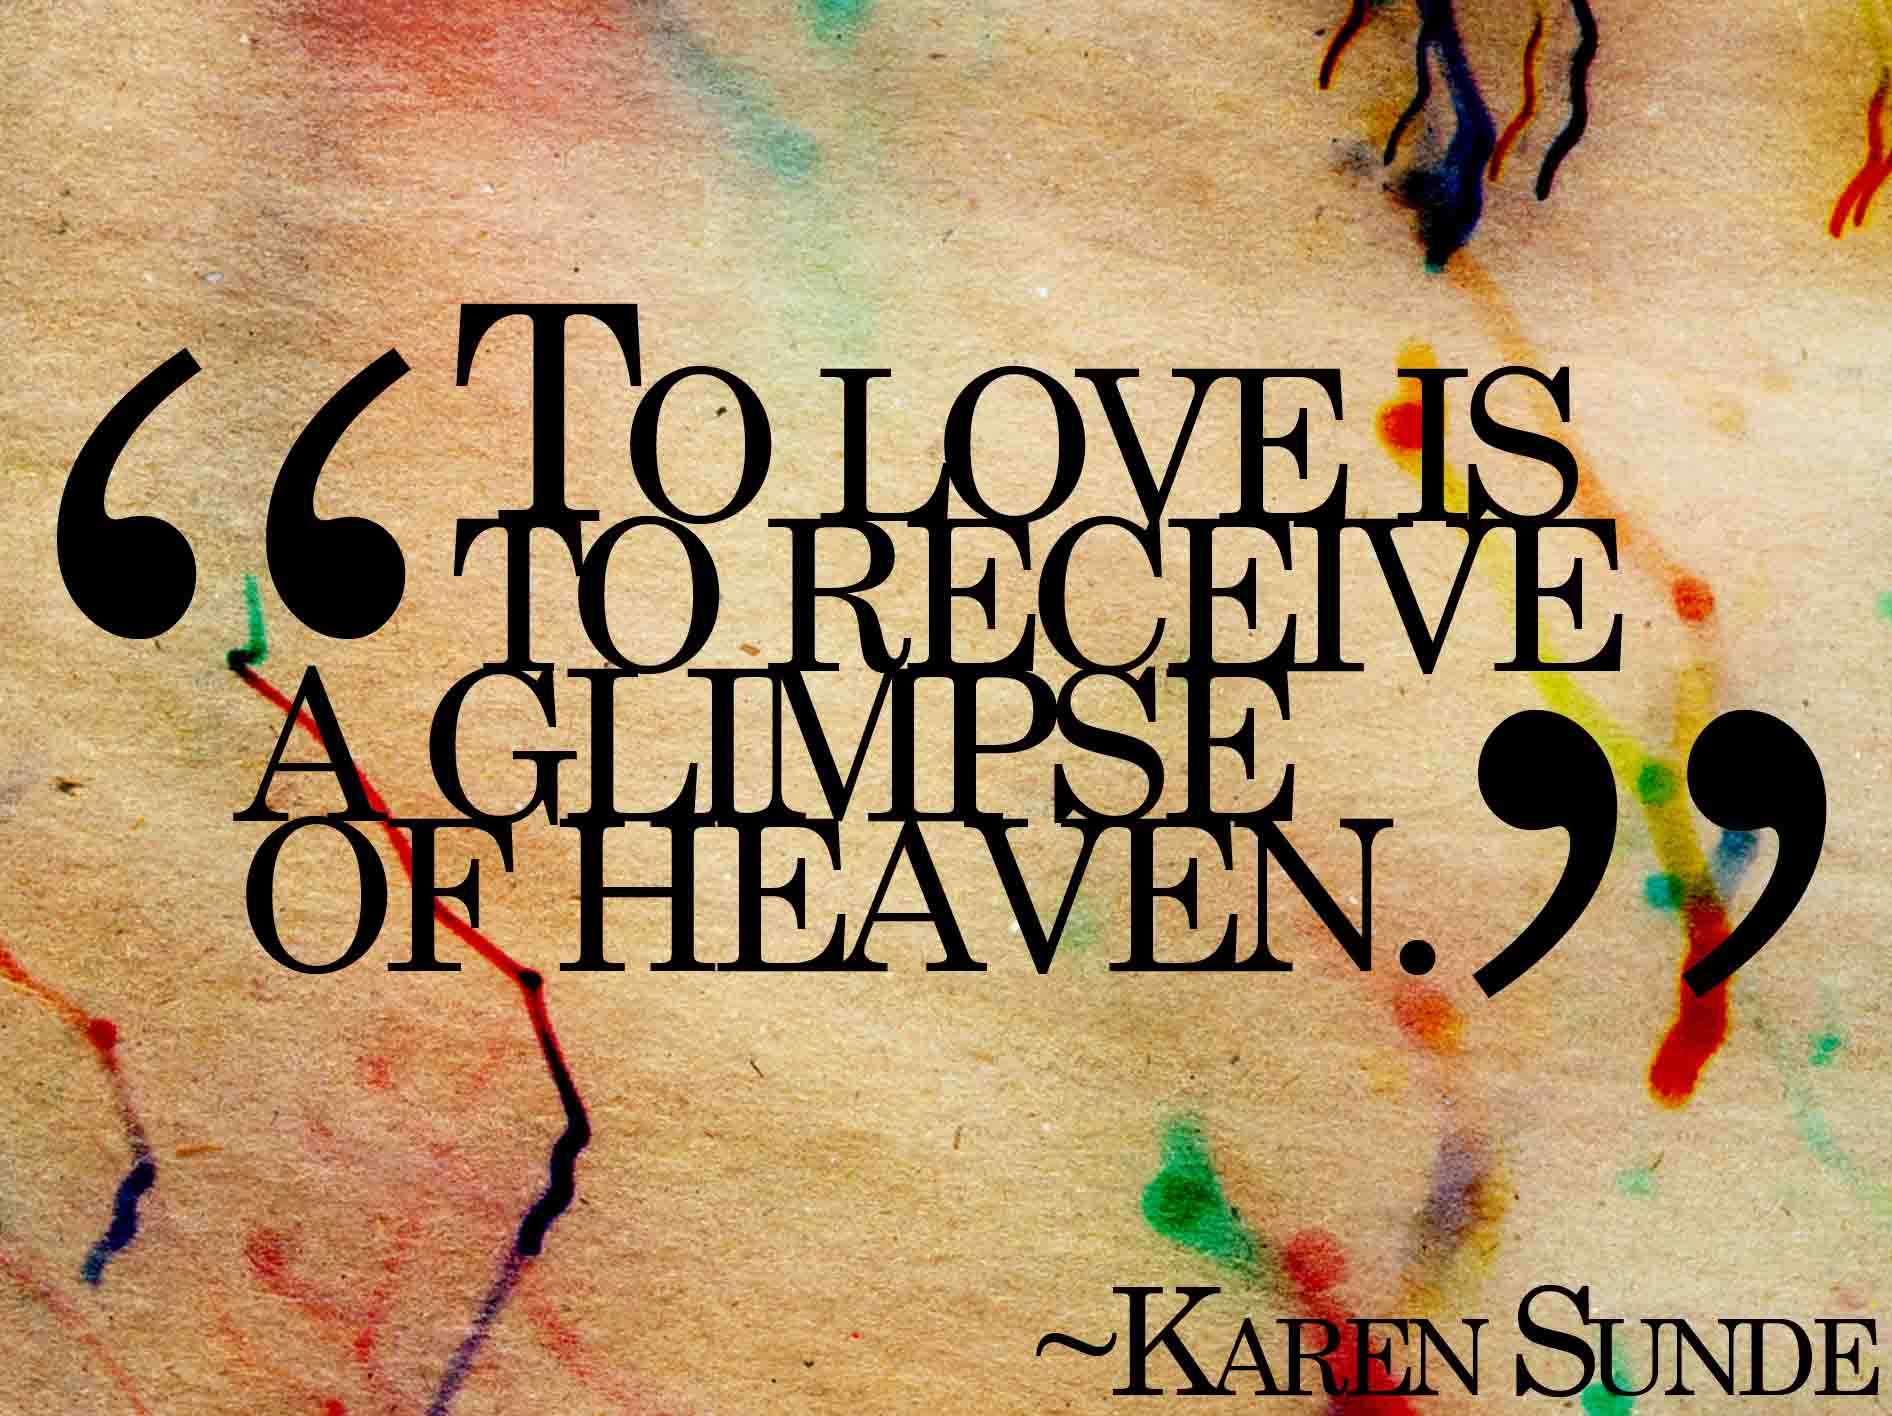 love quote love quote love quote love quote love quote love quote love